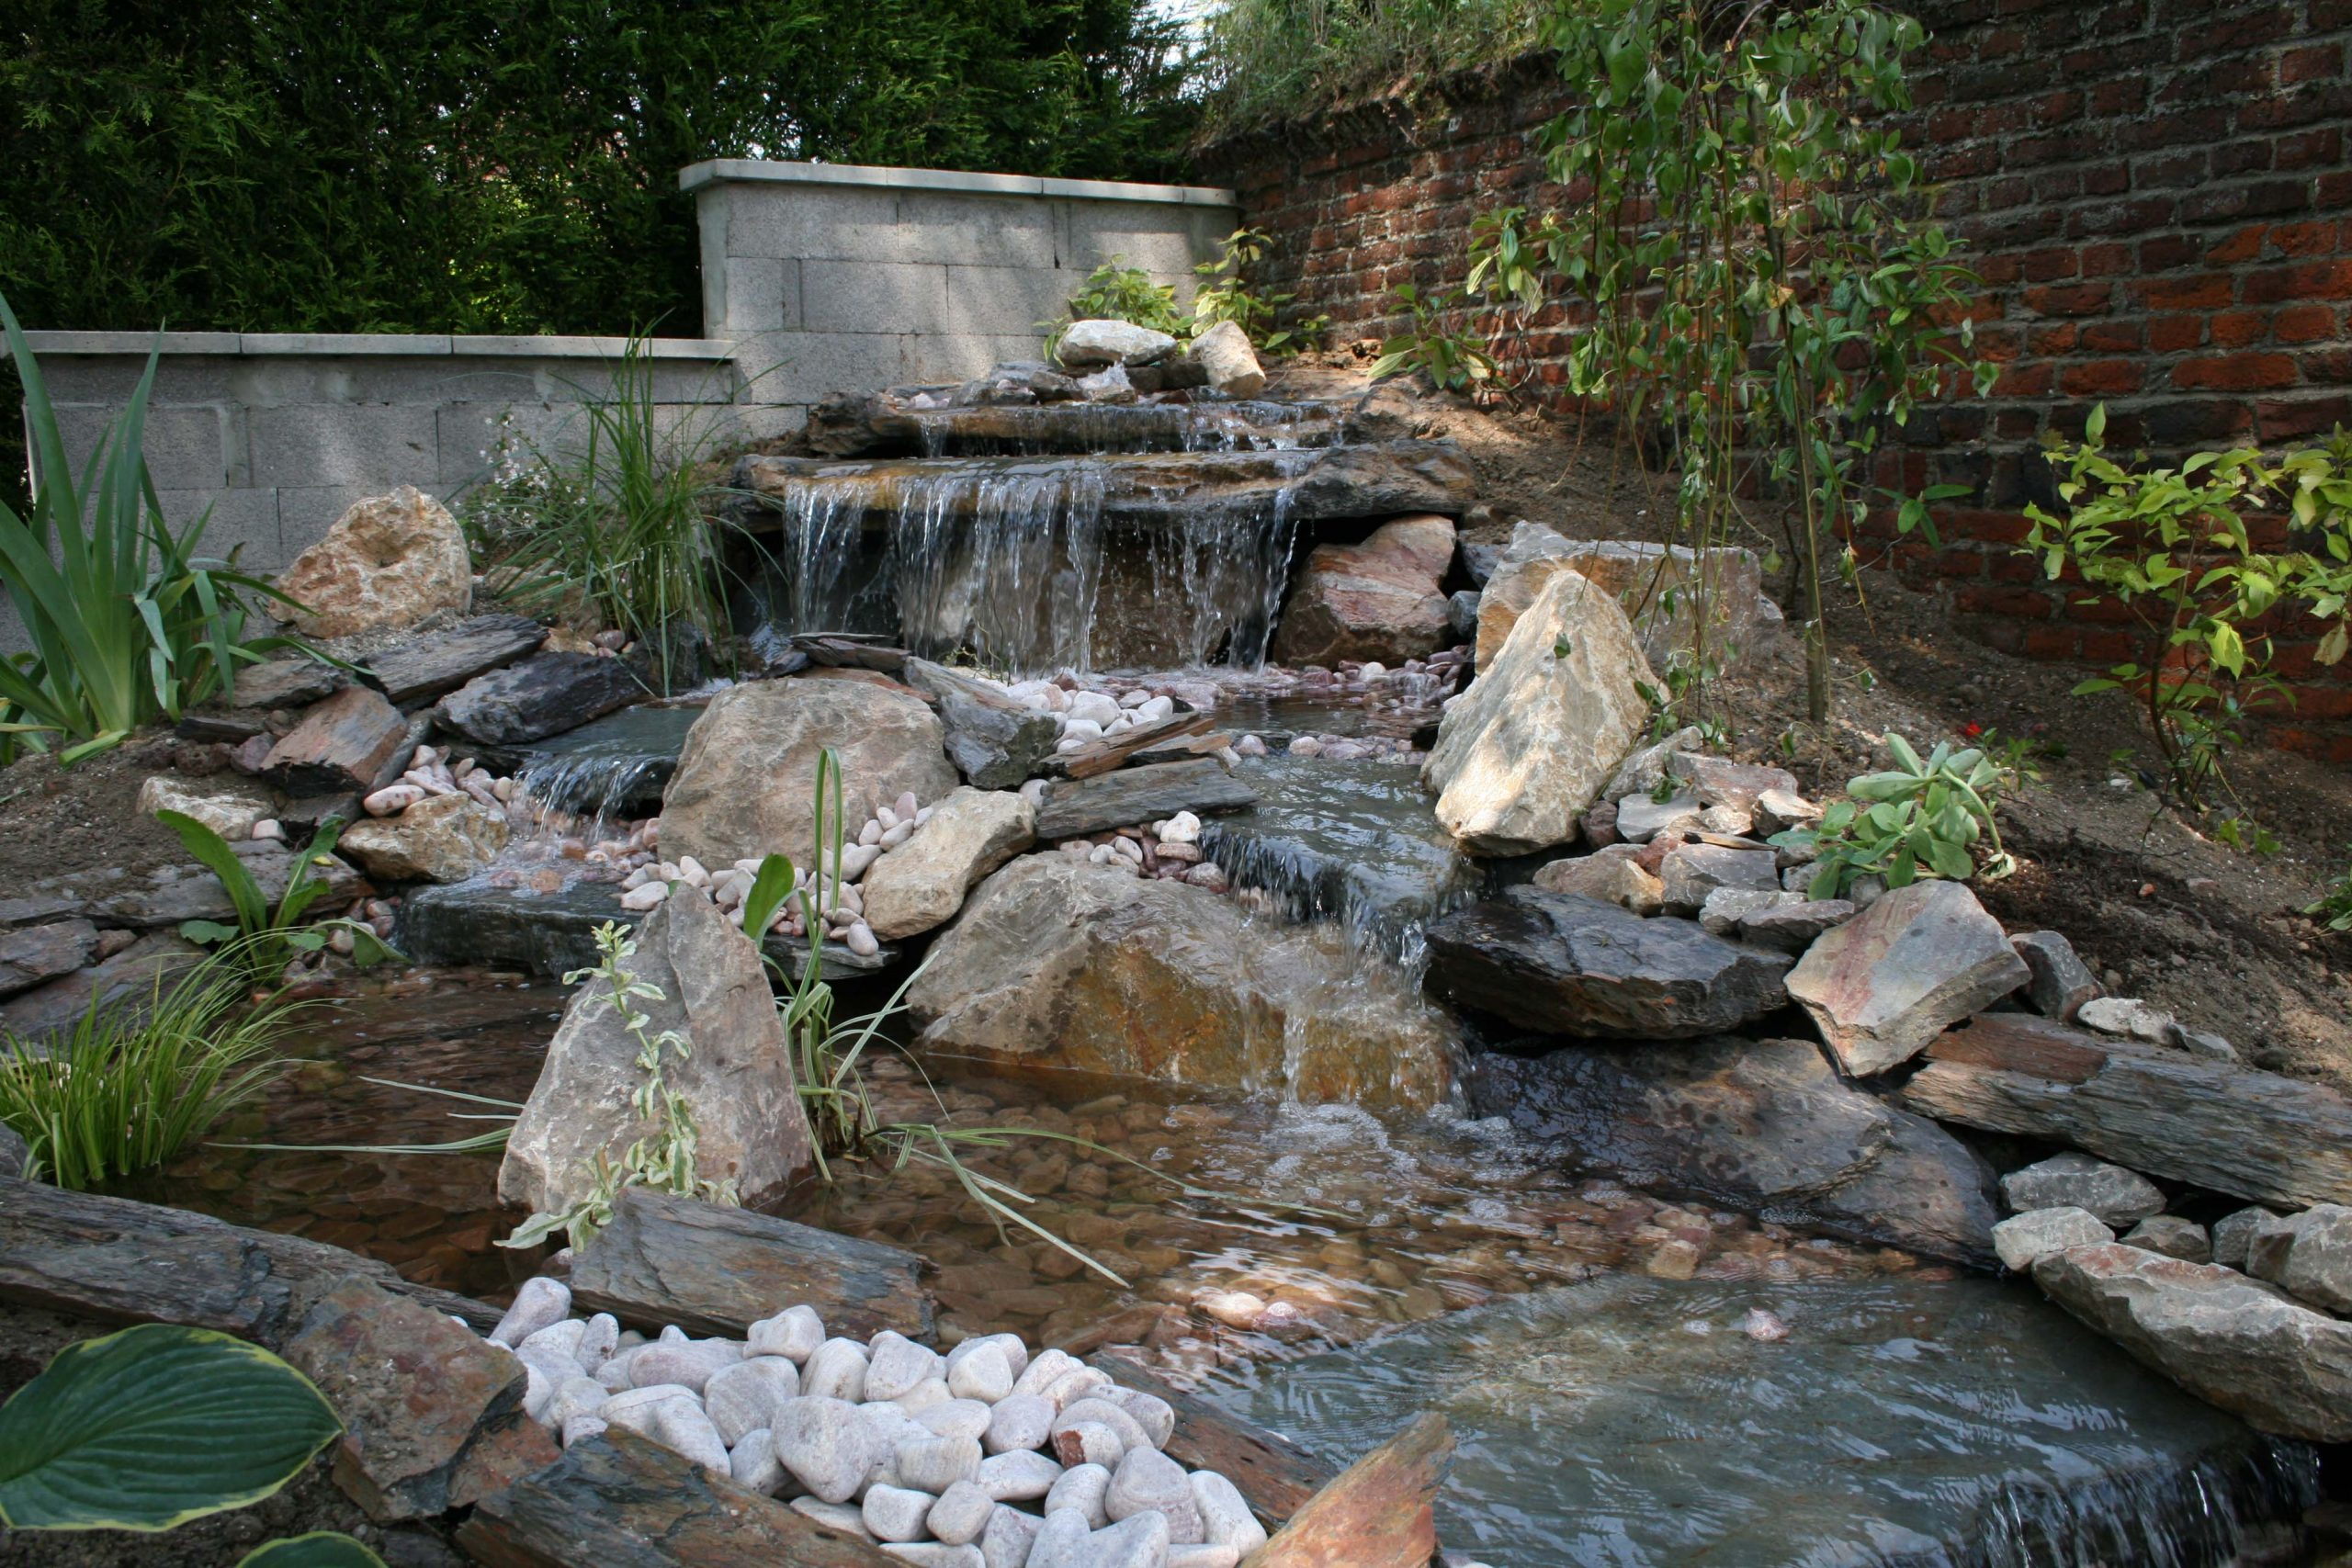 Cuisine: Ment Construire Sa Cascade Expert Bassin Cascade ... destiné Plante Bassin De Jardin